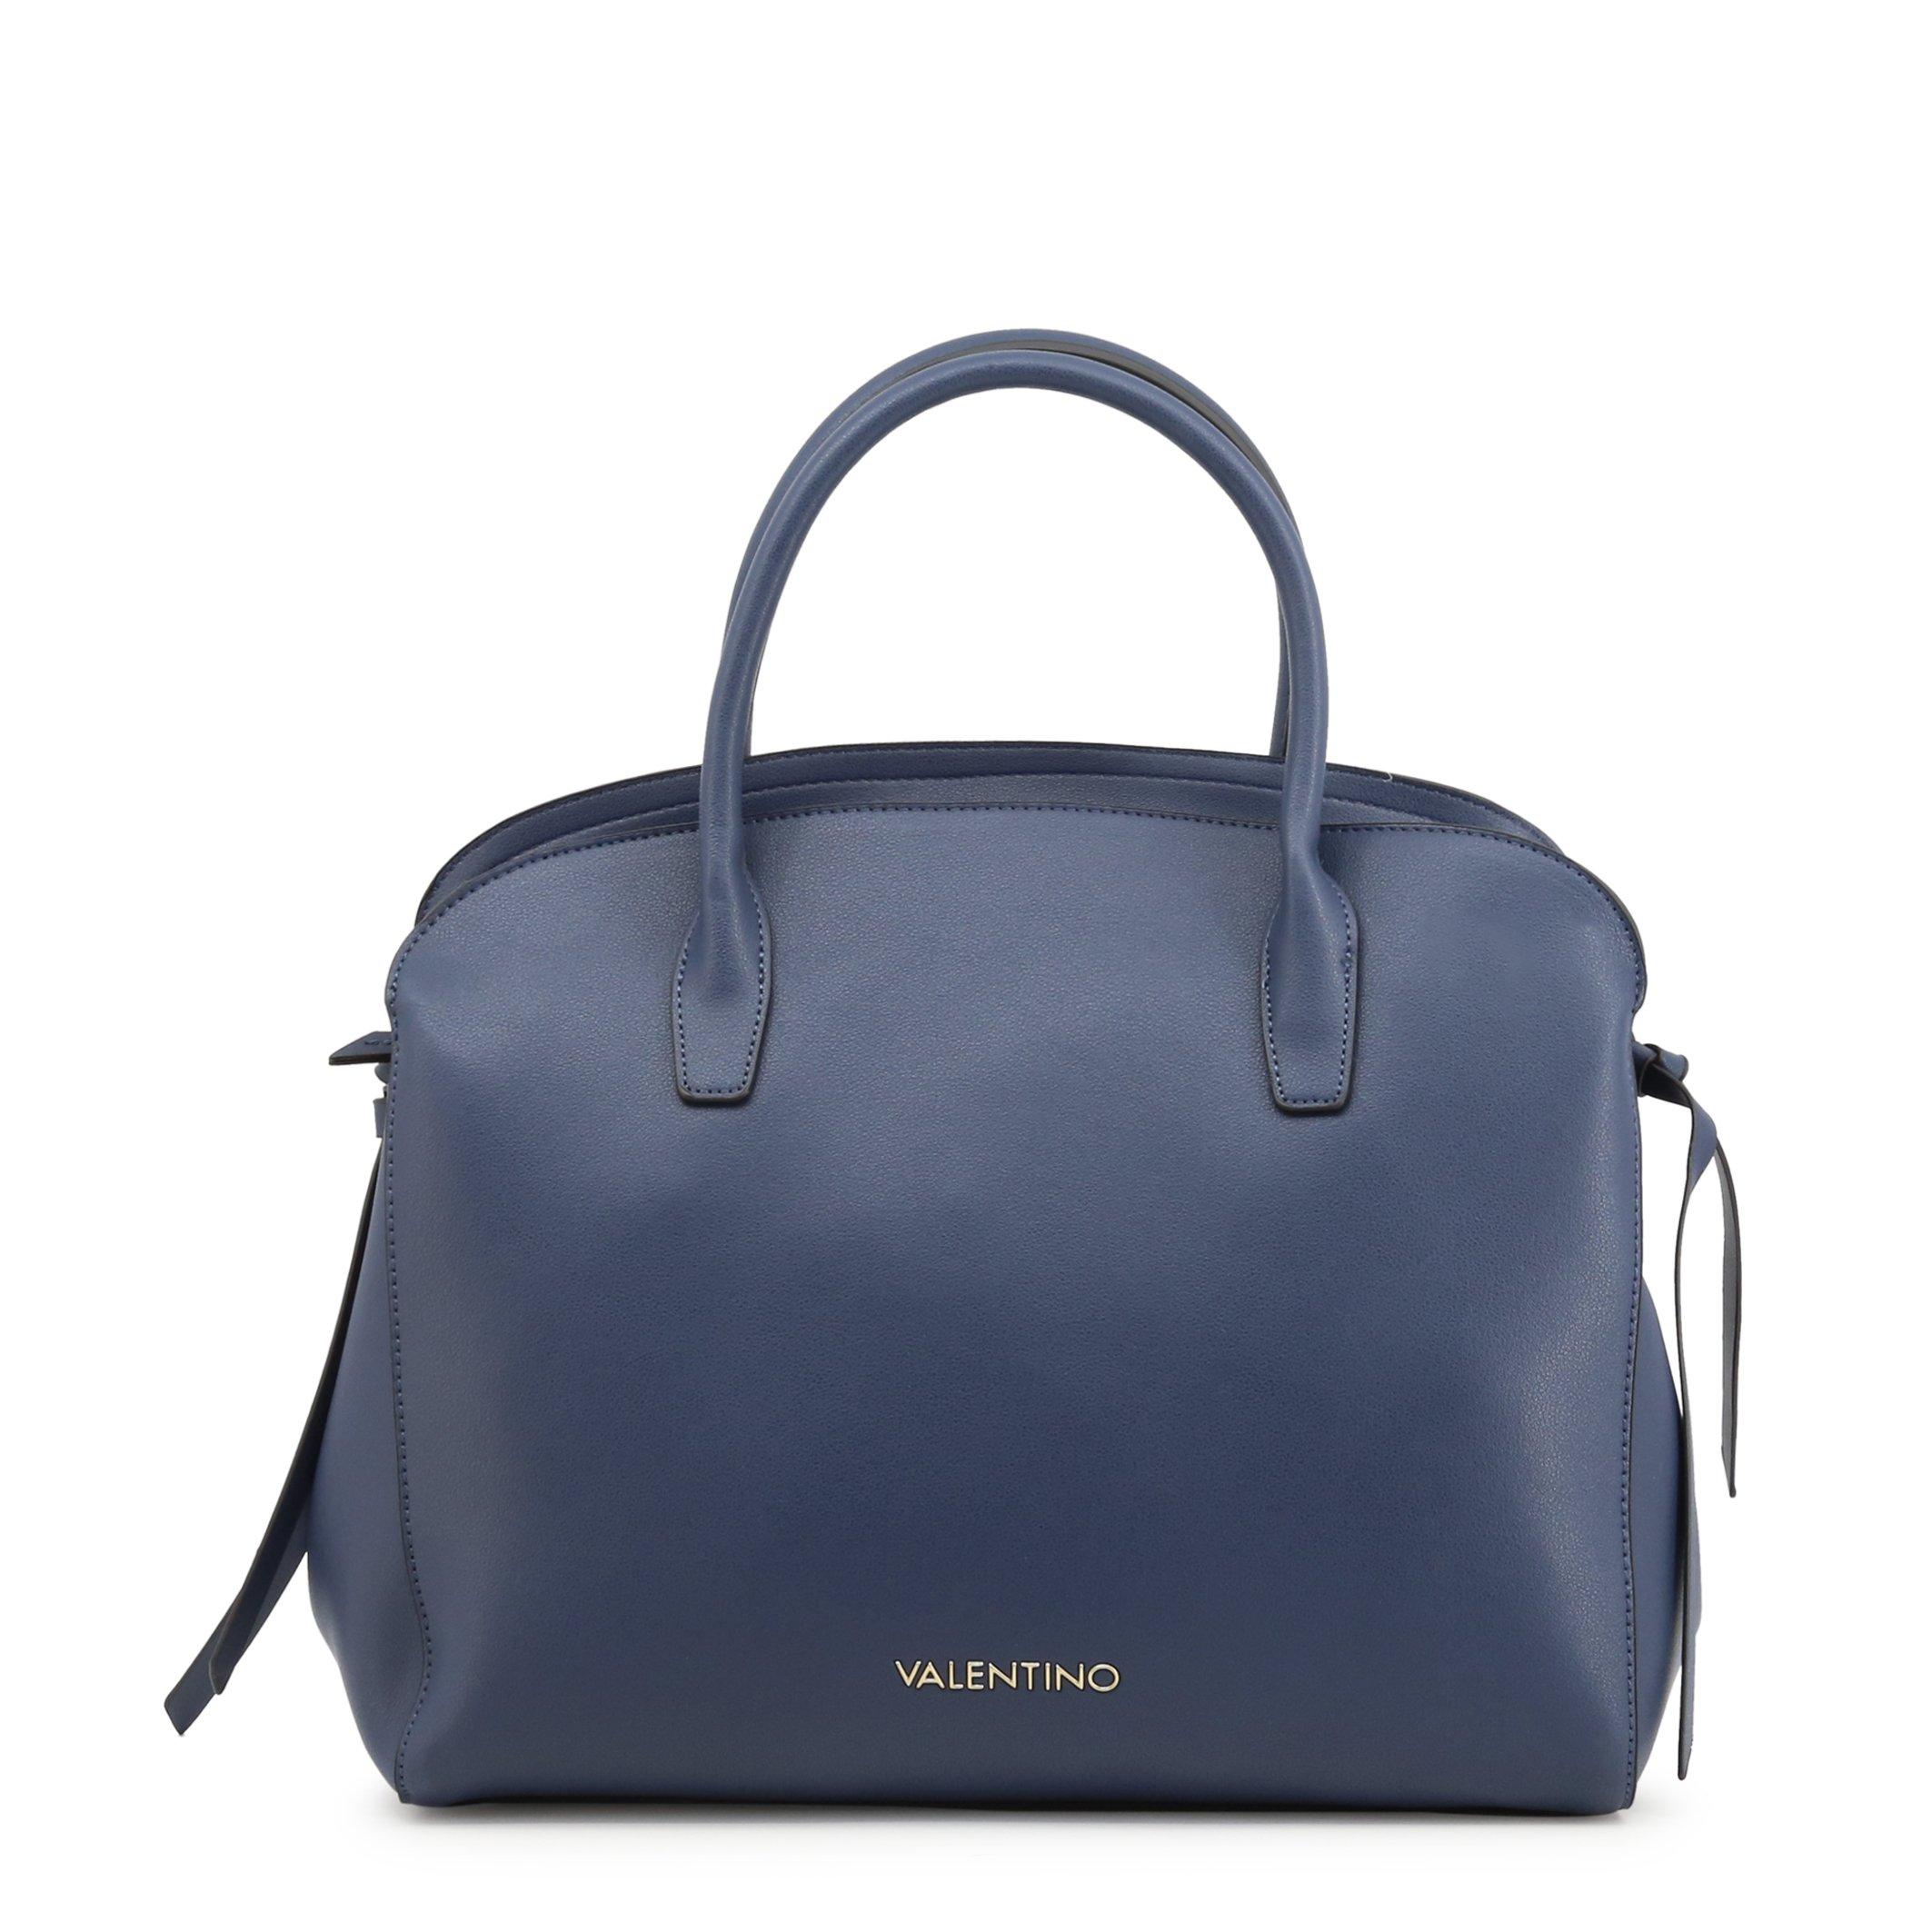 Valentino by Mario Valentino Women's Shopping Bag Various Colours BURU-VBS3UO01 - blue NOSIZE